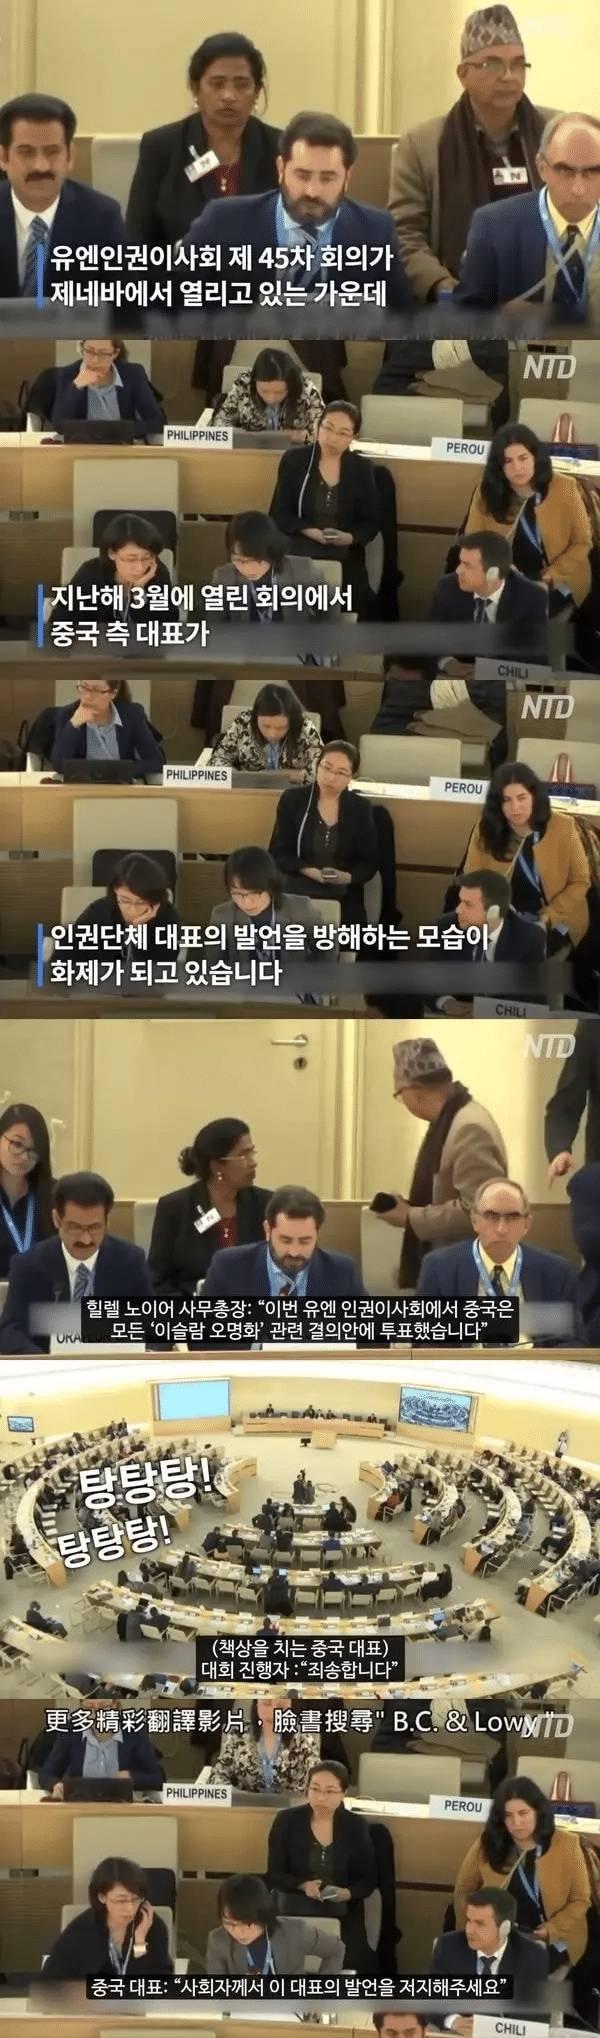 UN 회의에서 '위구르'가 나오면 생기는 일 | 인스티즈